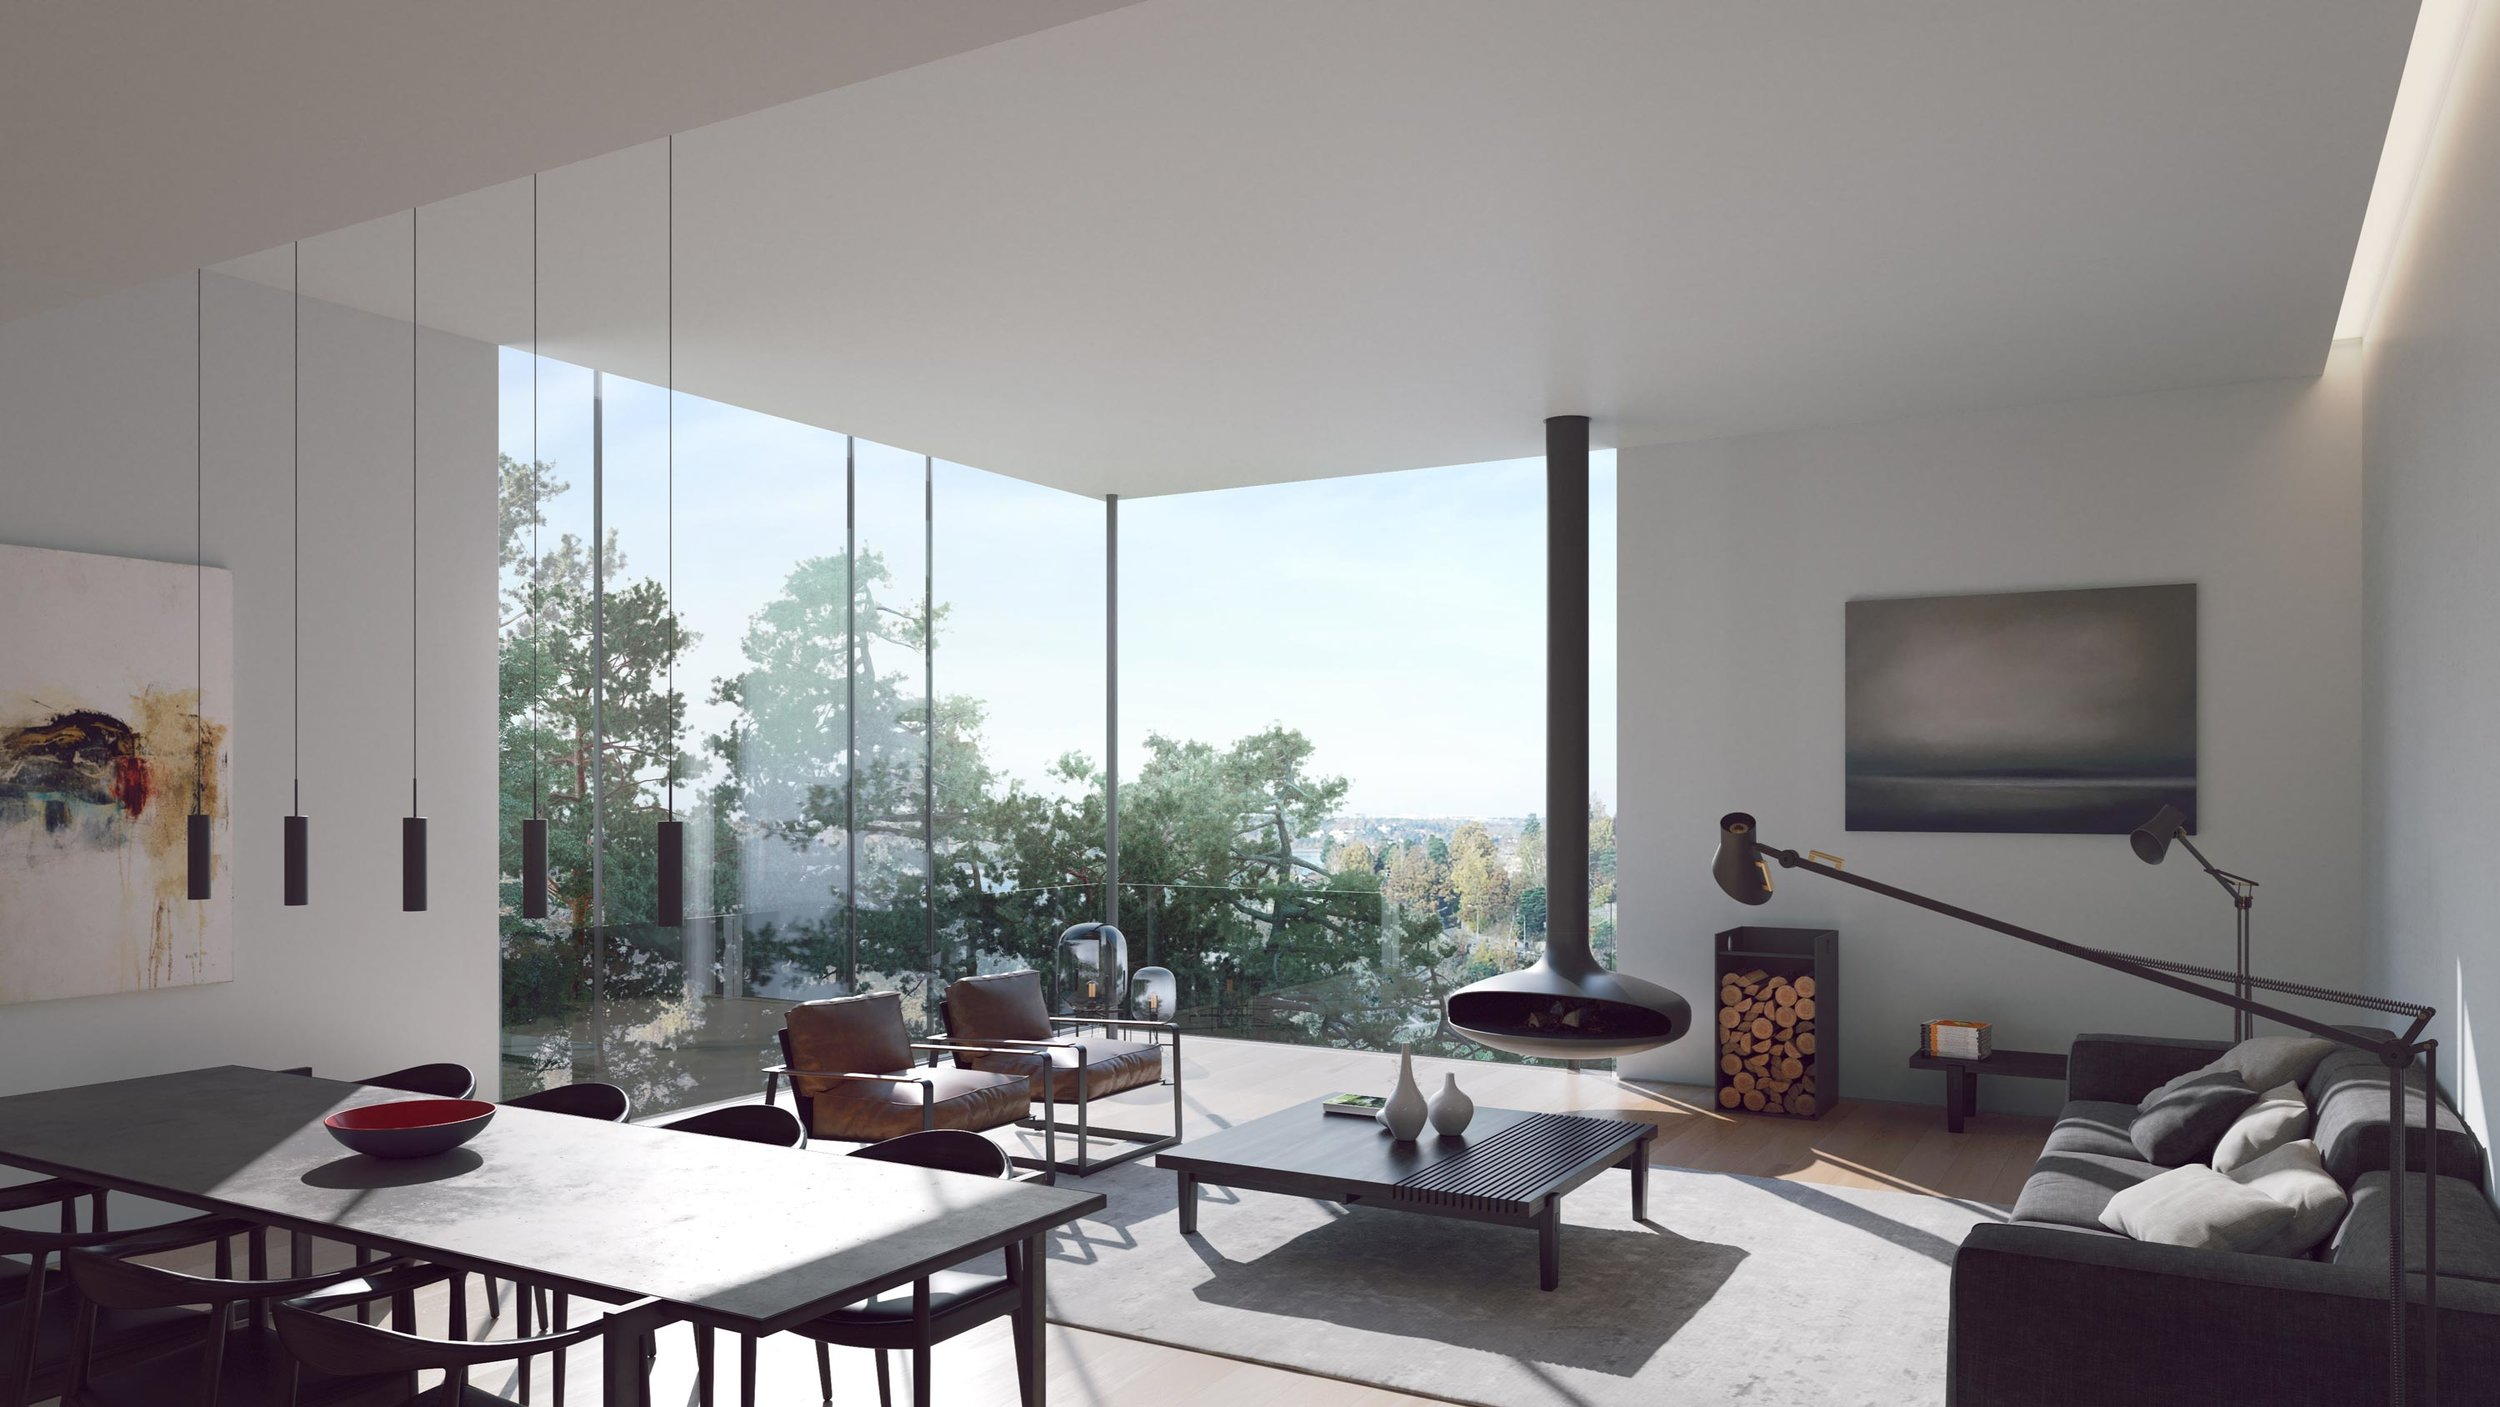 pyrus luxury villas, strom architects, imola, 10.jpg